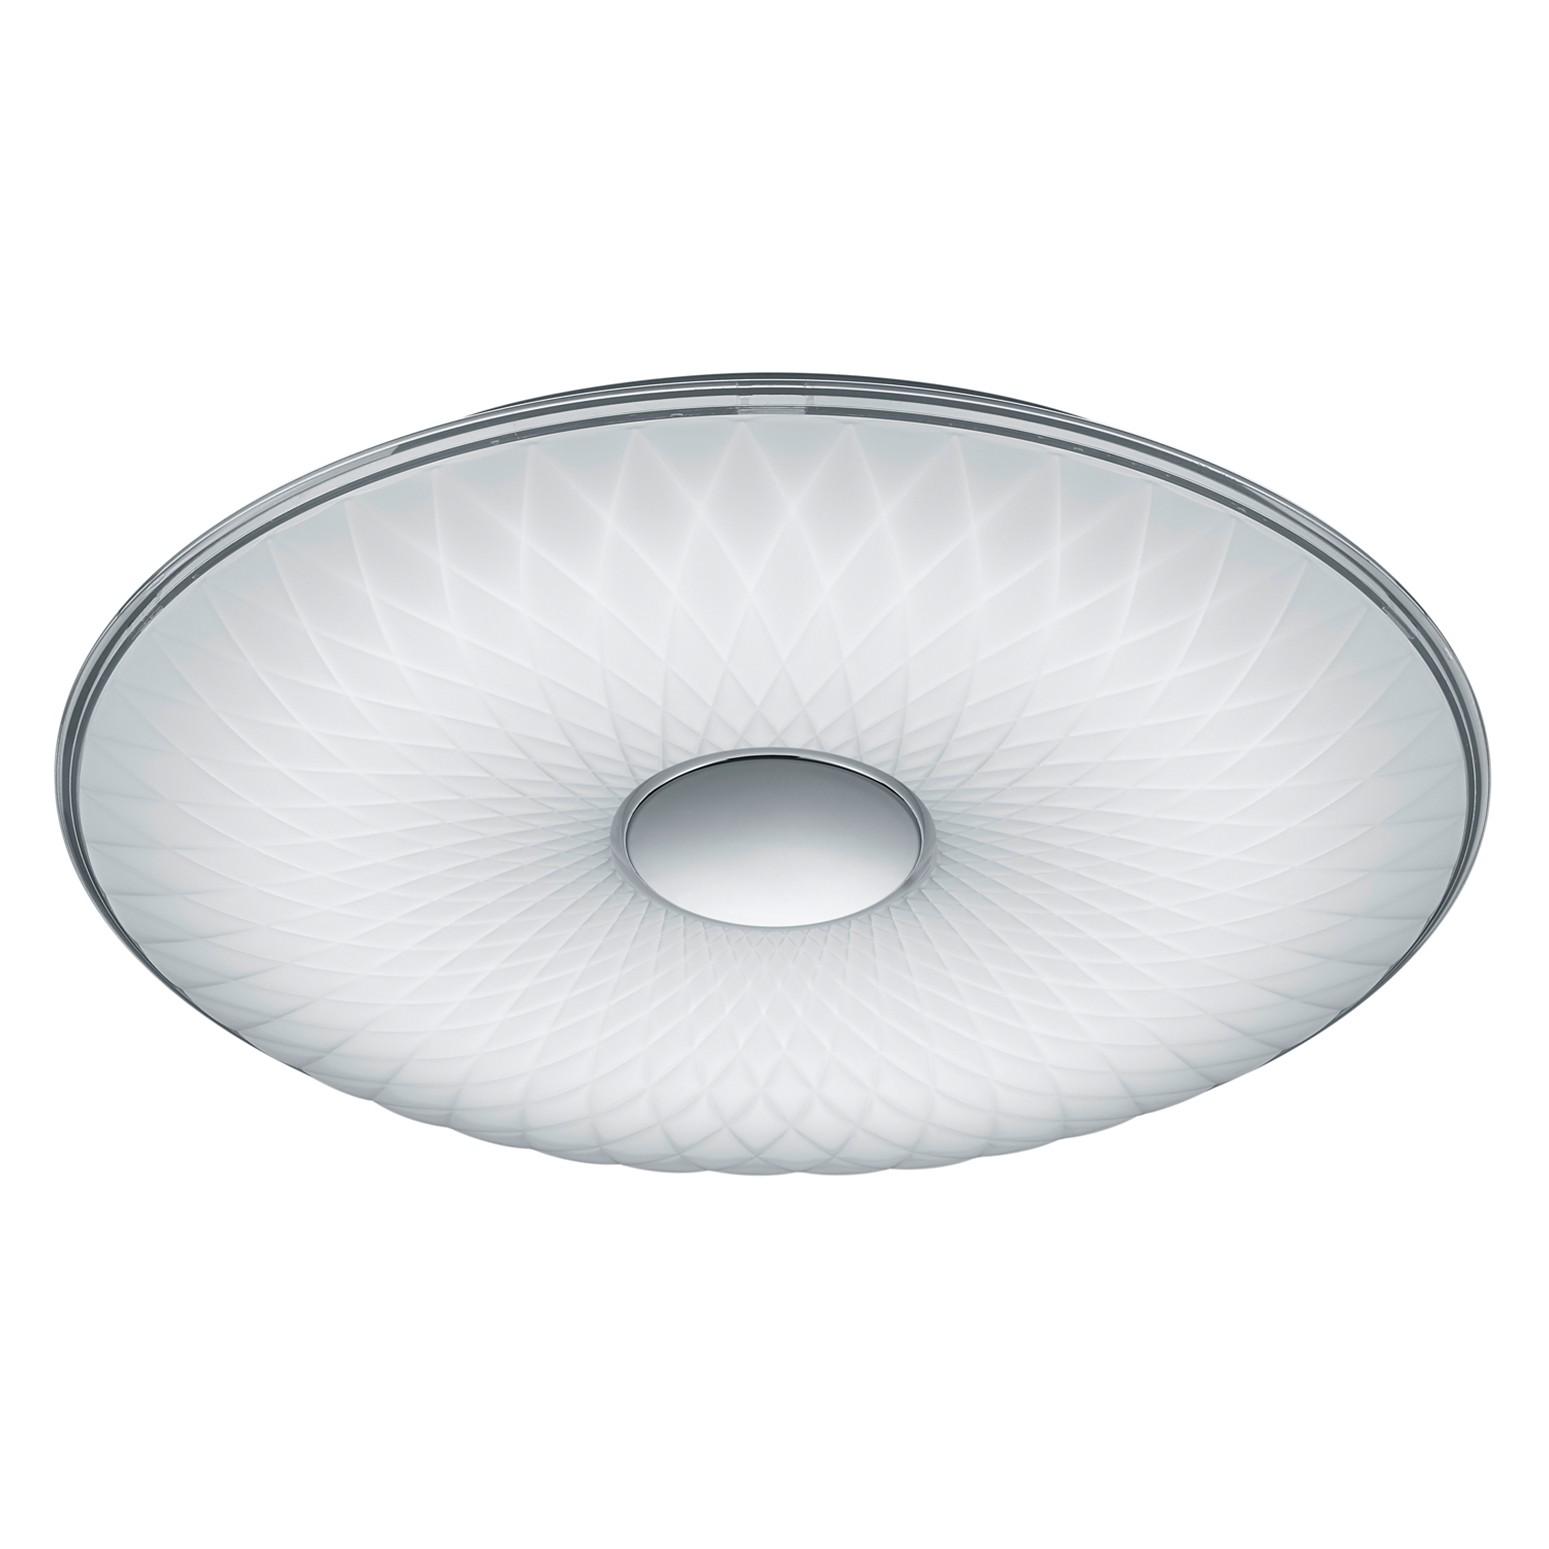 khg led tischleuchte wei wei ma e cm b 9 h 40 lampen leuchten innenleuchten. Black Bedroom Furniture Sets. Home Design Ideas